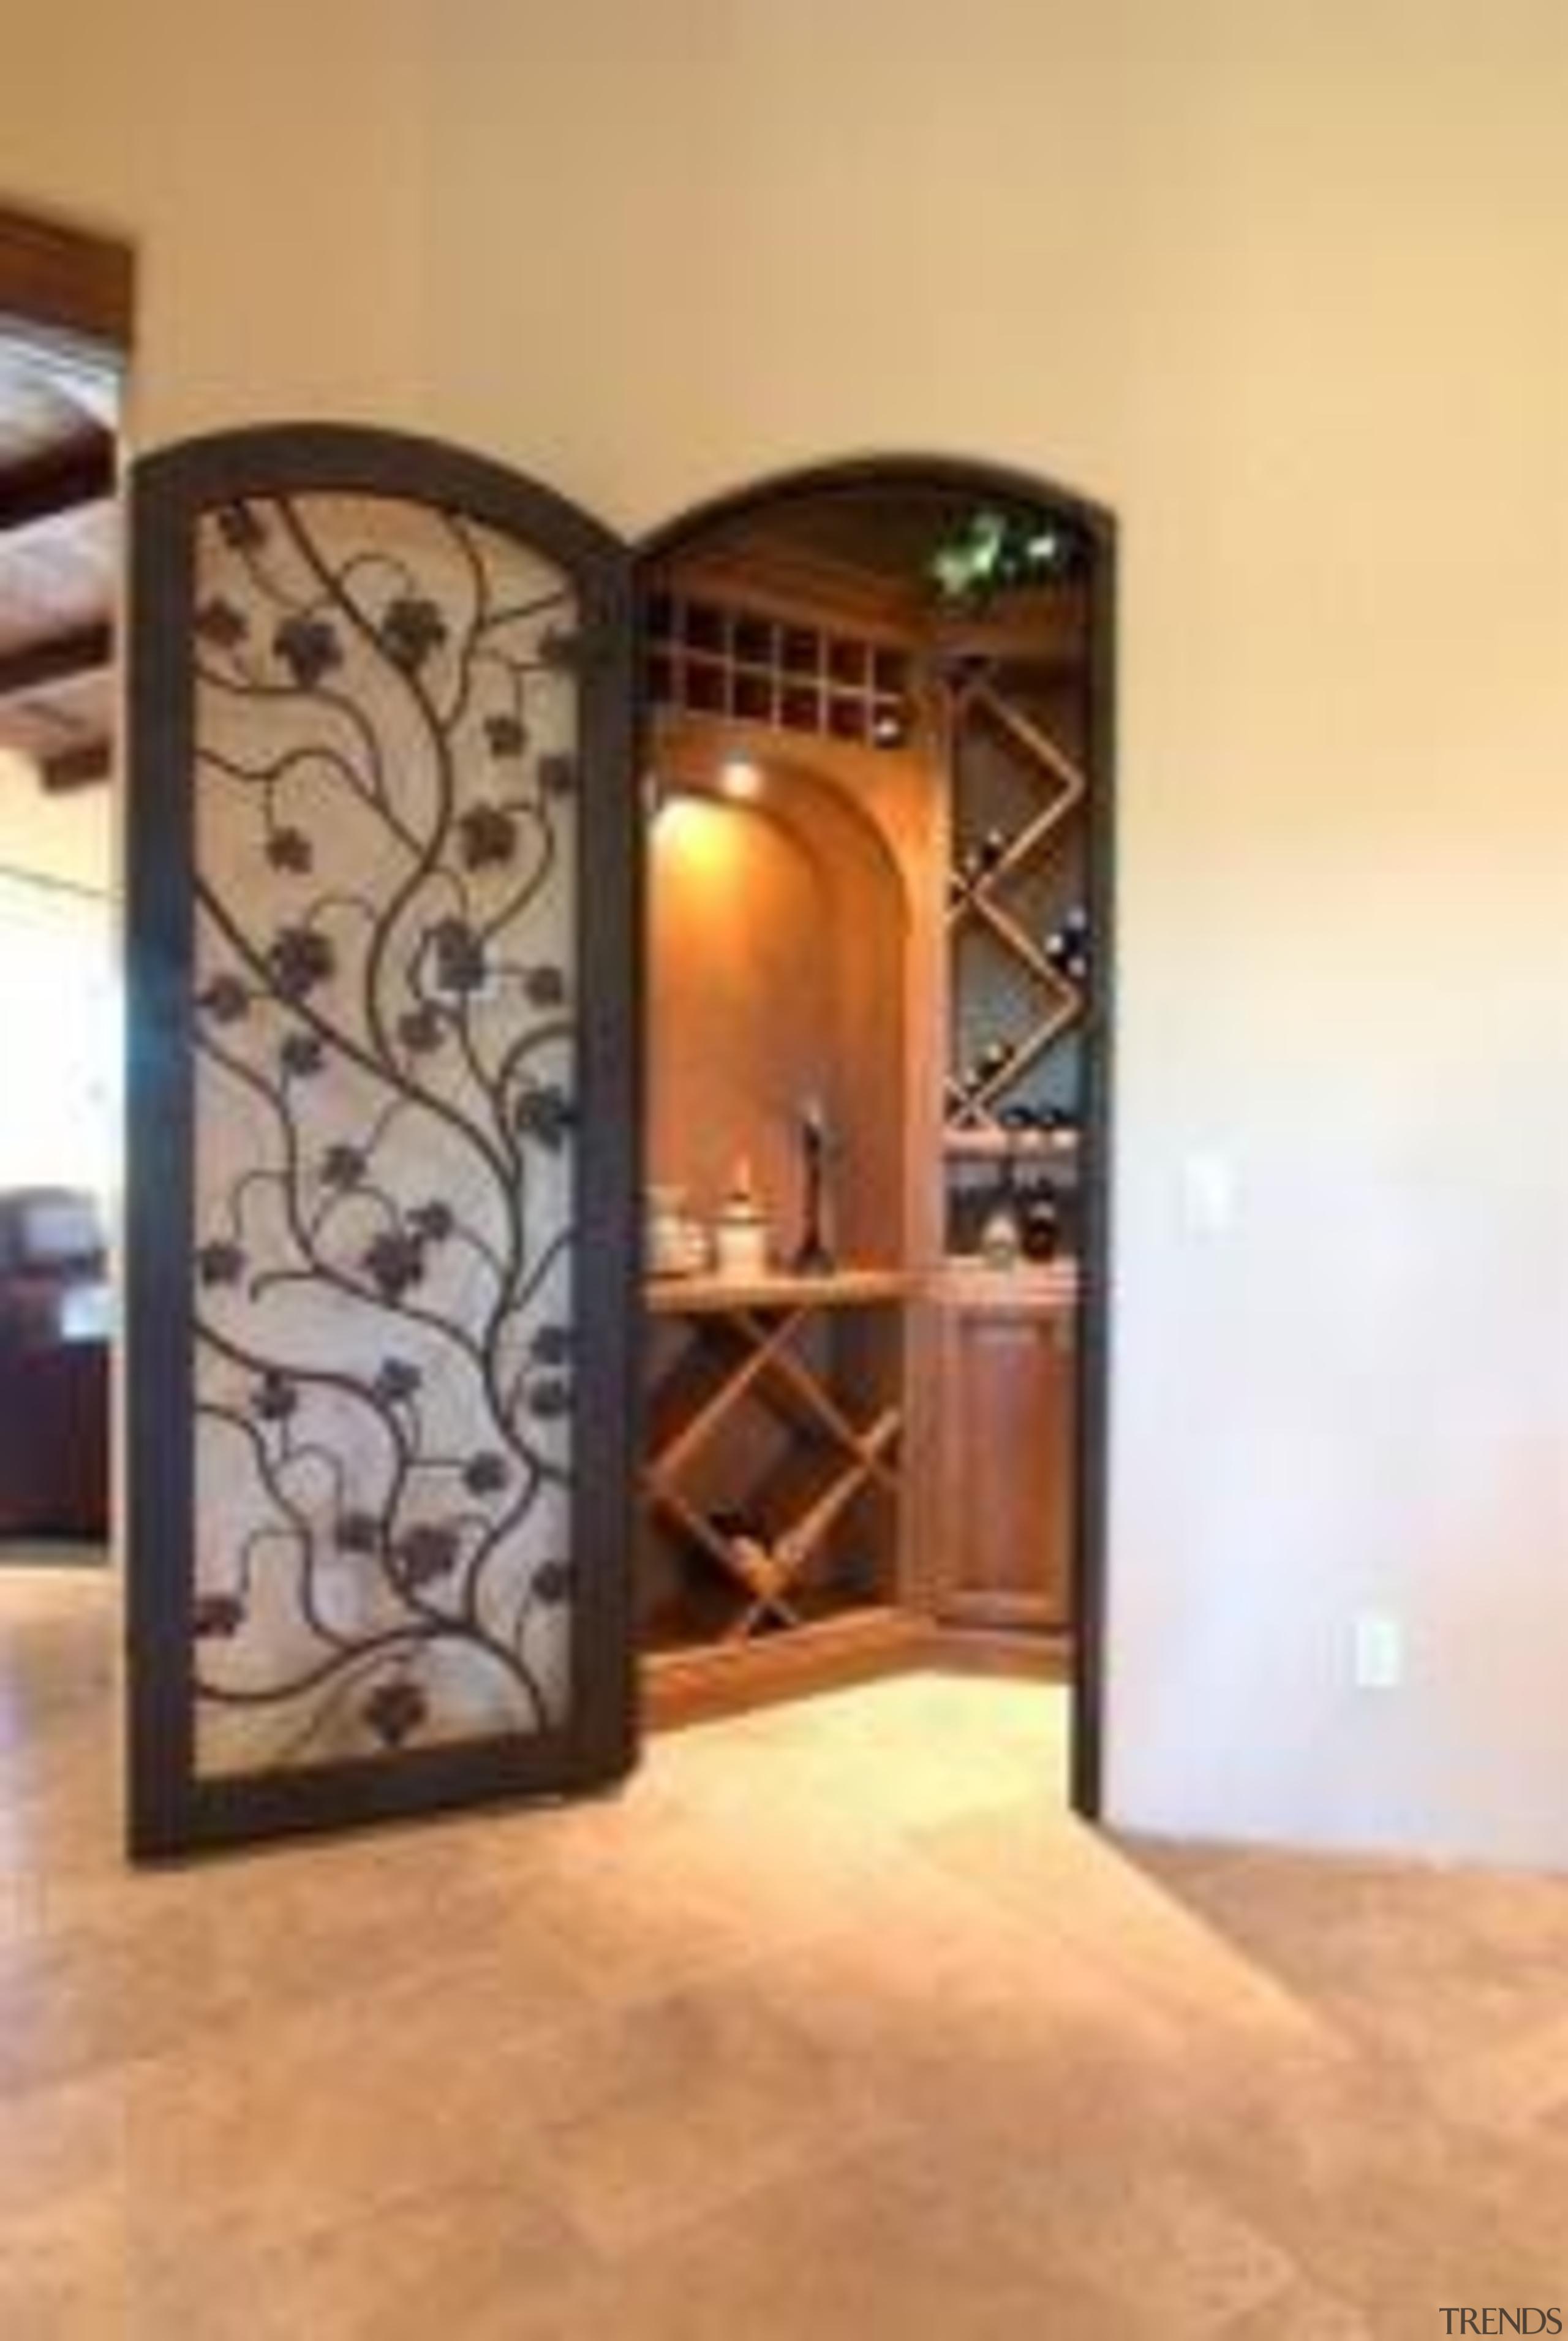 Modern Wine Cellar Ideas - Modern Wine Cellar door, floor, flooring, glass, interior design, wall, orange